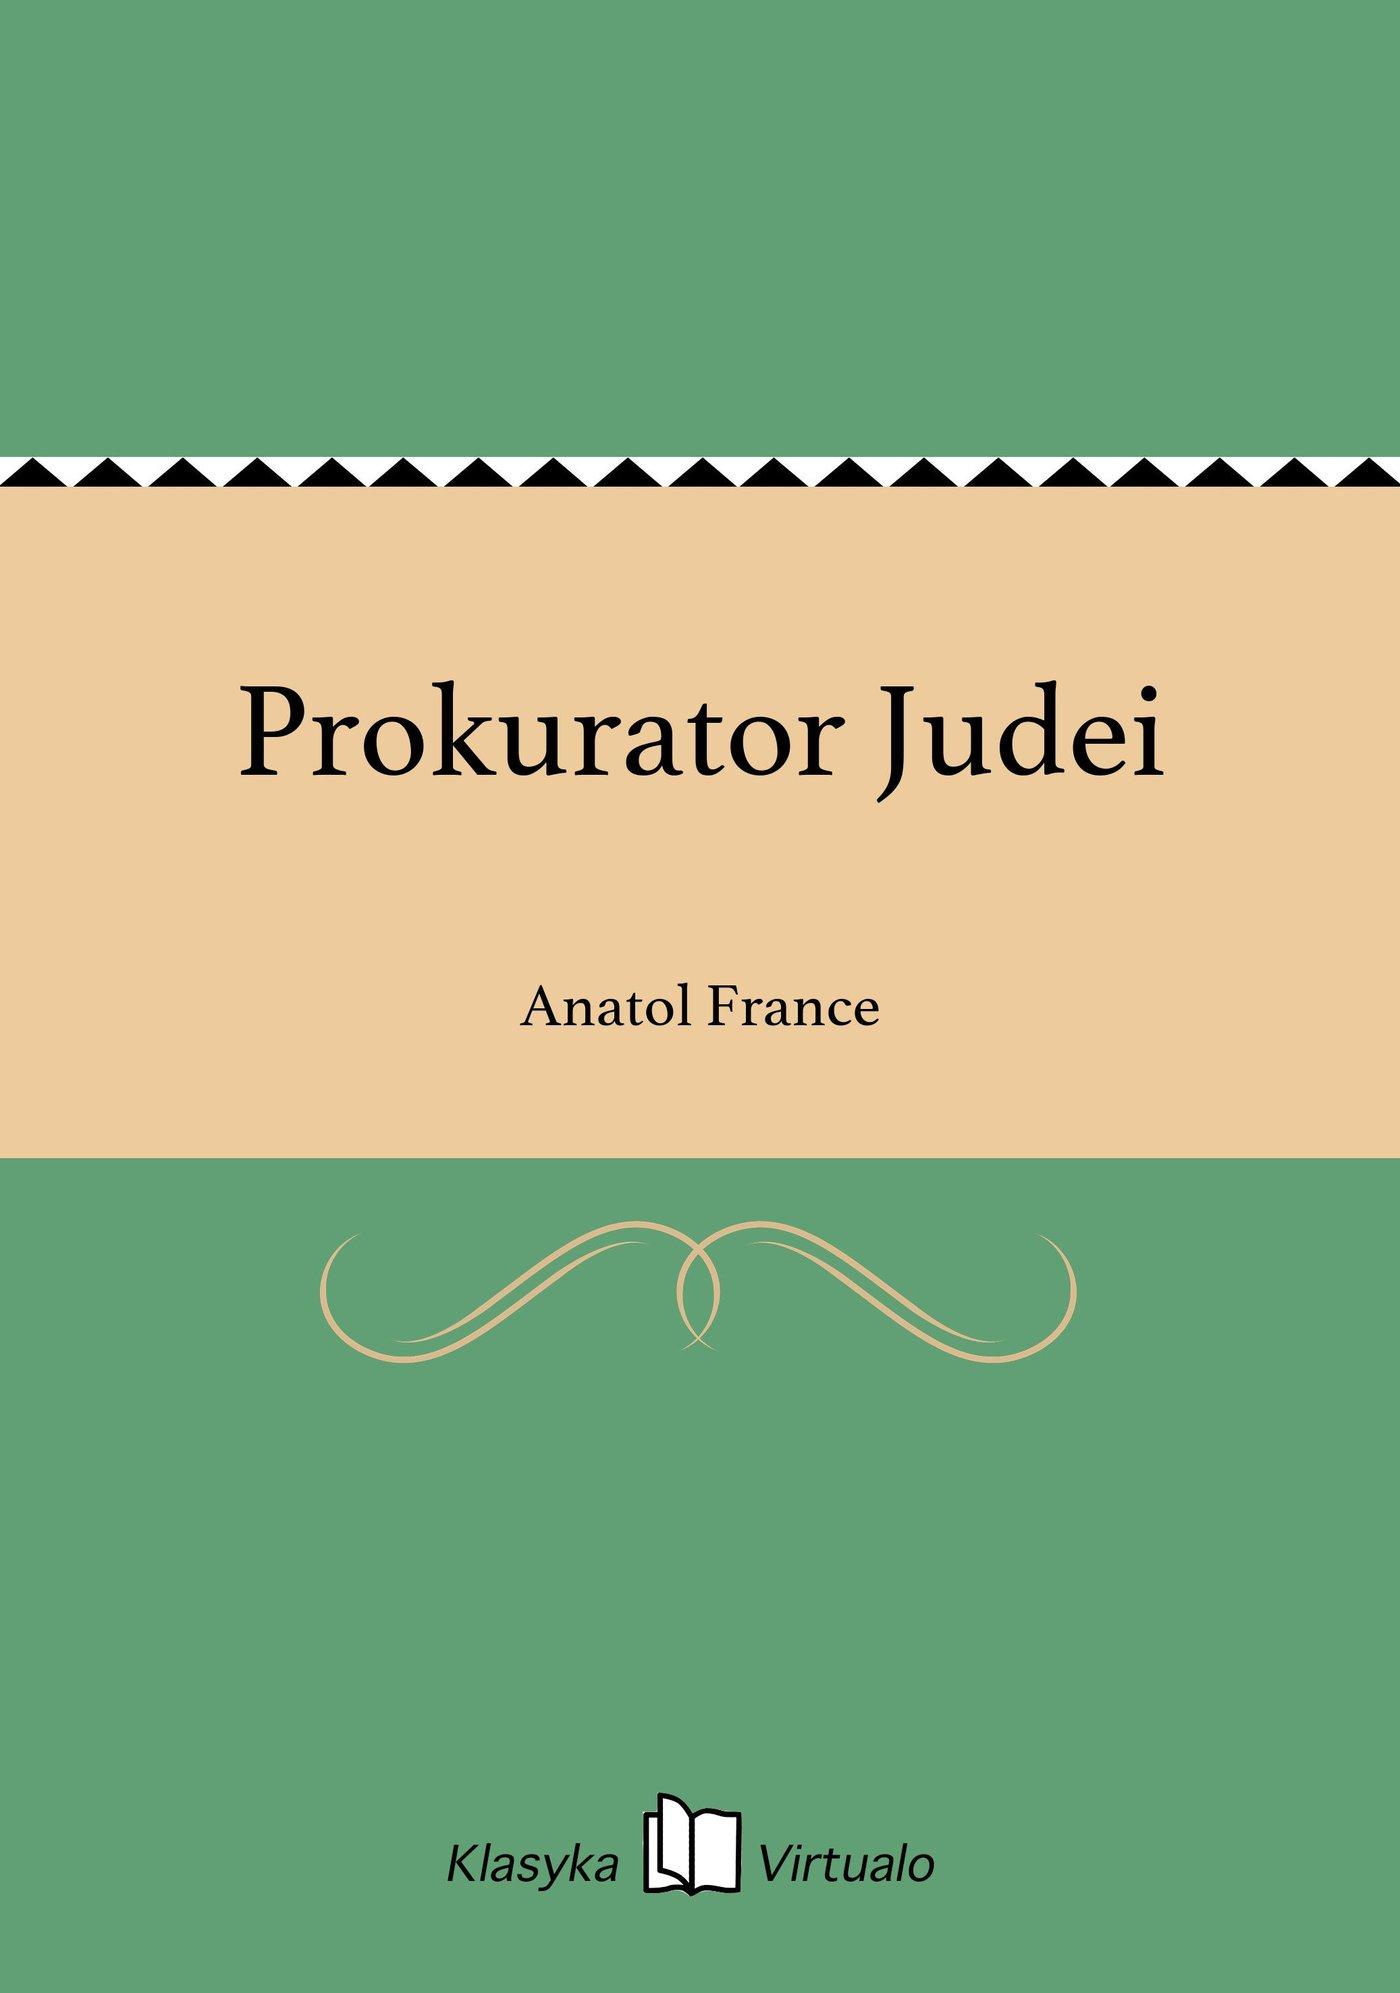 Prokurator Judei - Ebook (Książka na Kindle) do pobrania w formacie MOBI